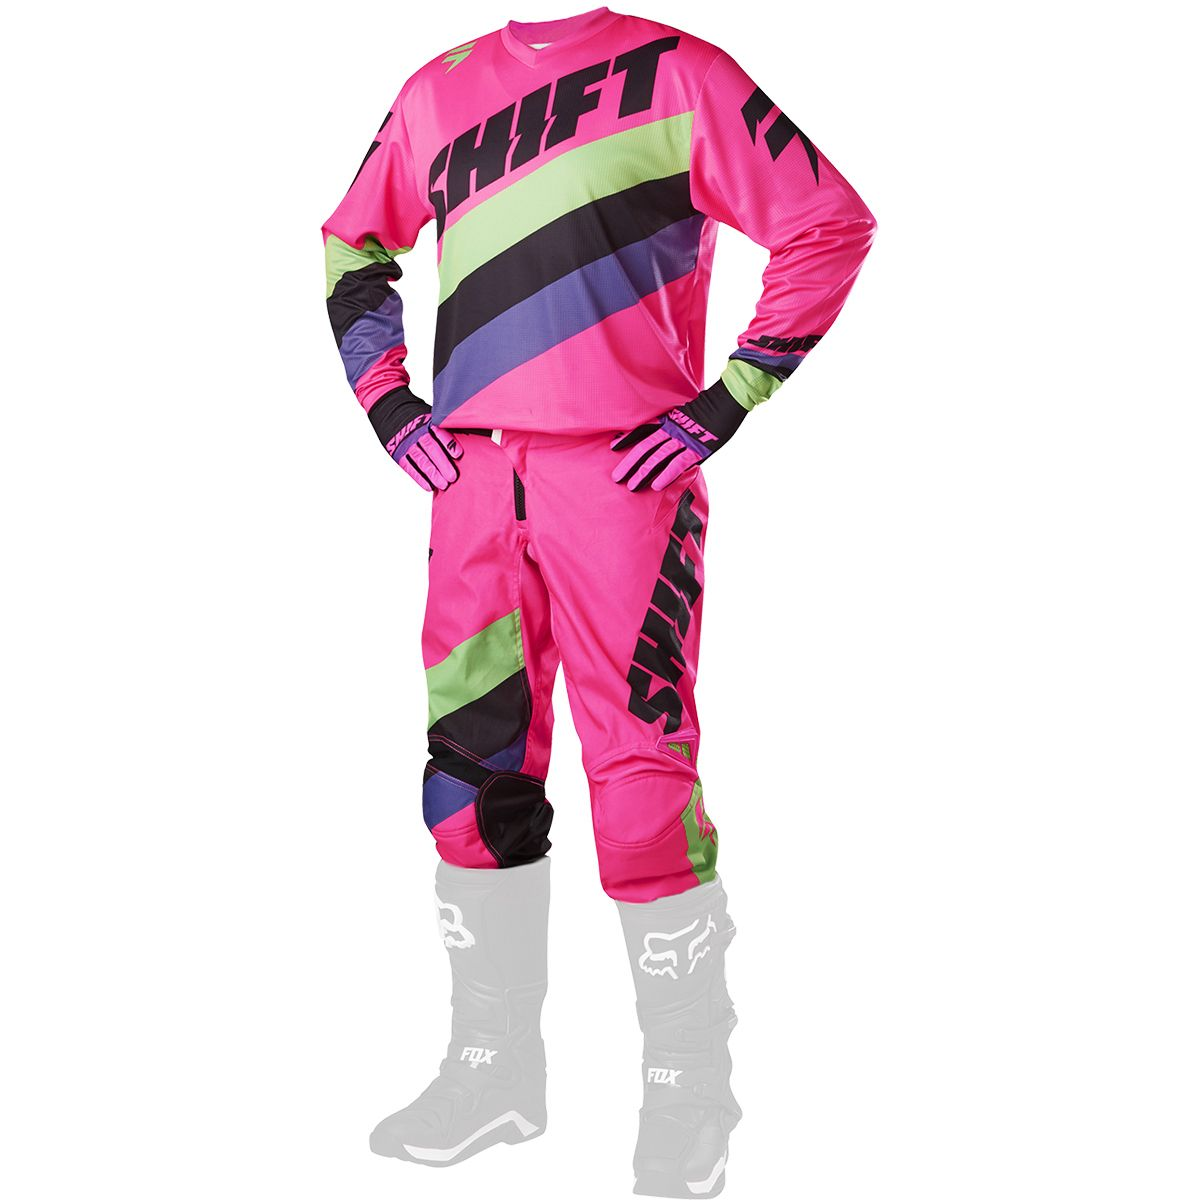 Shift - 2017 WHIT3 Tarmac комплект штаны и джерси, черно-розовые